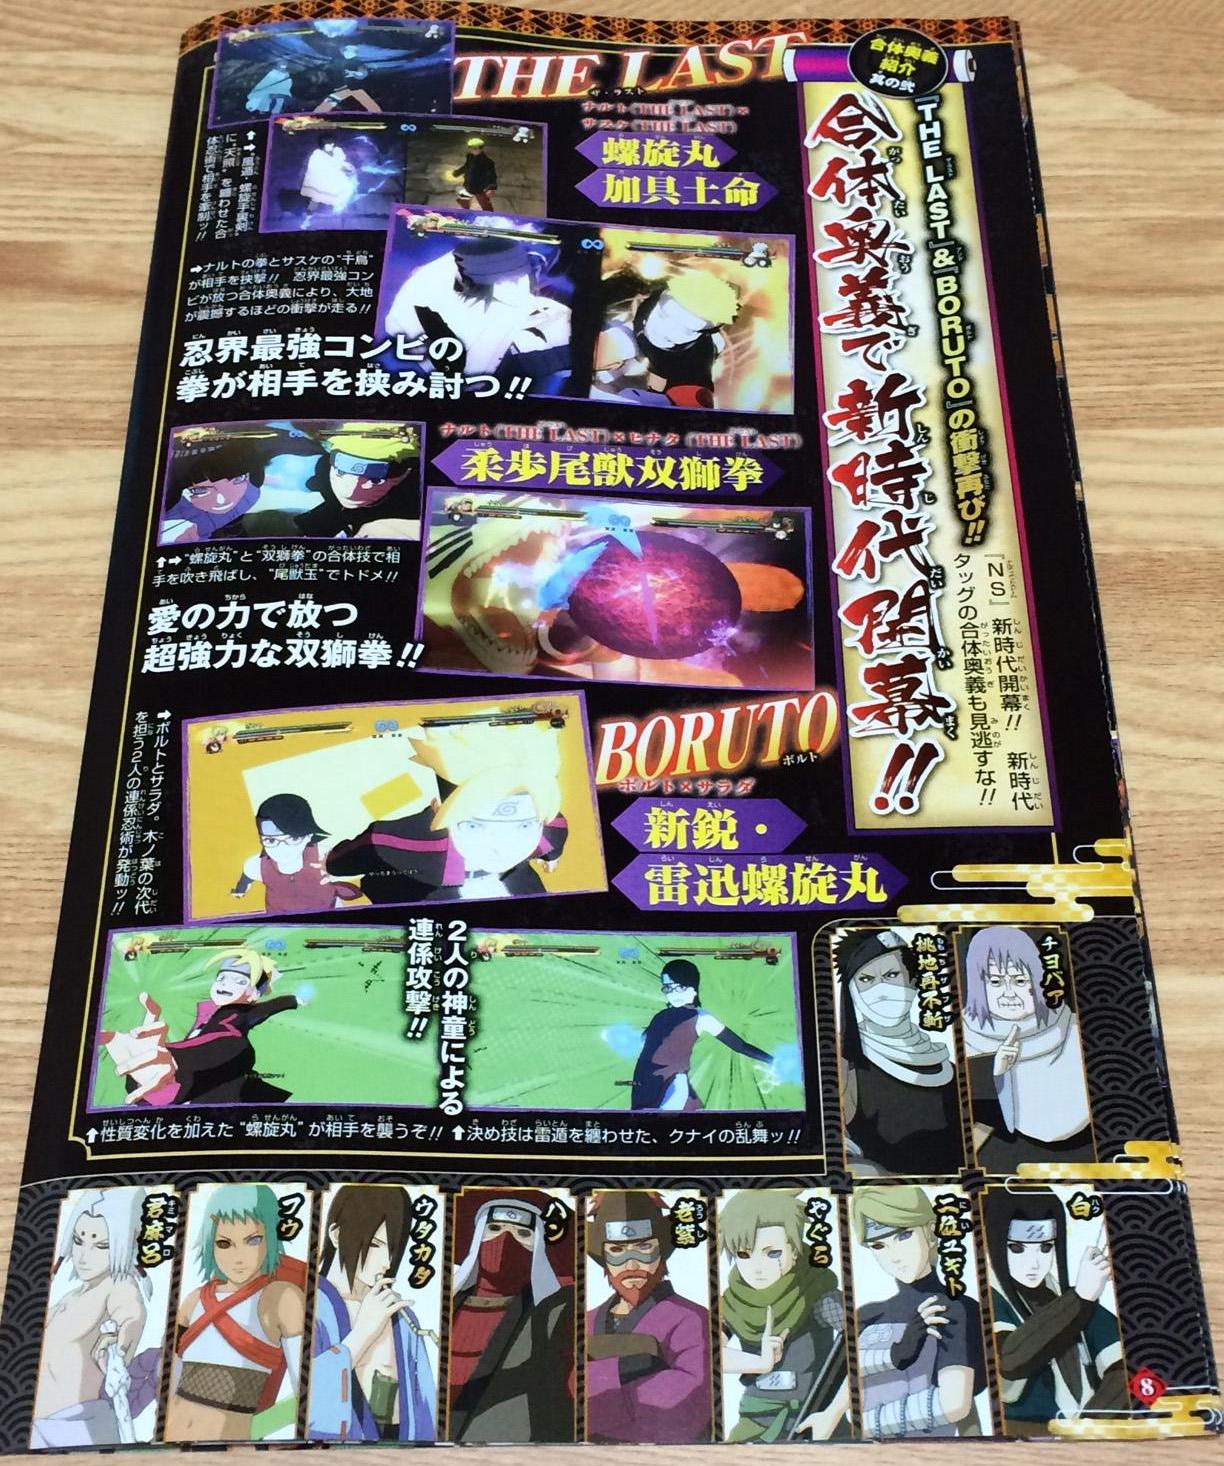 Naruto-Storm-4-tarama-3 Naruto Storm 4'den yepyeni bir oynayış videosu